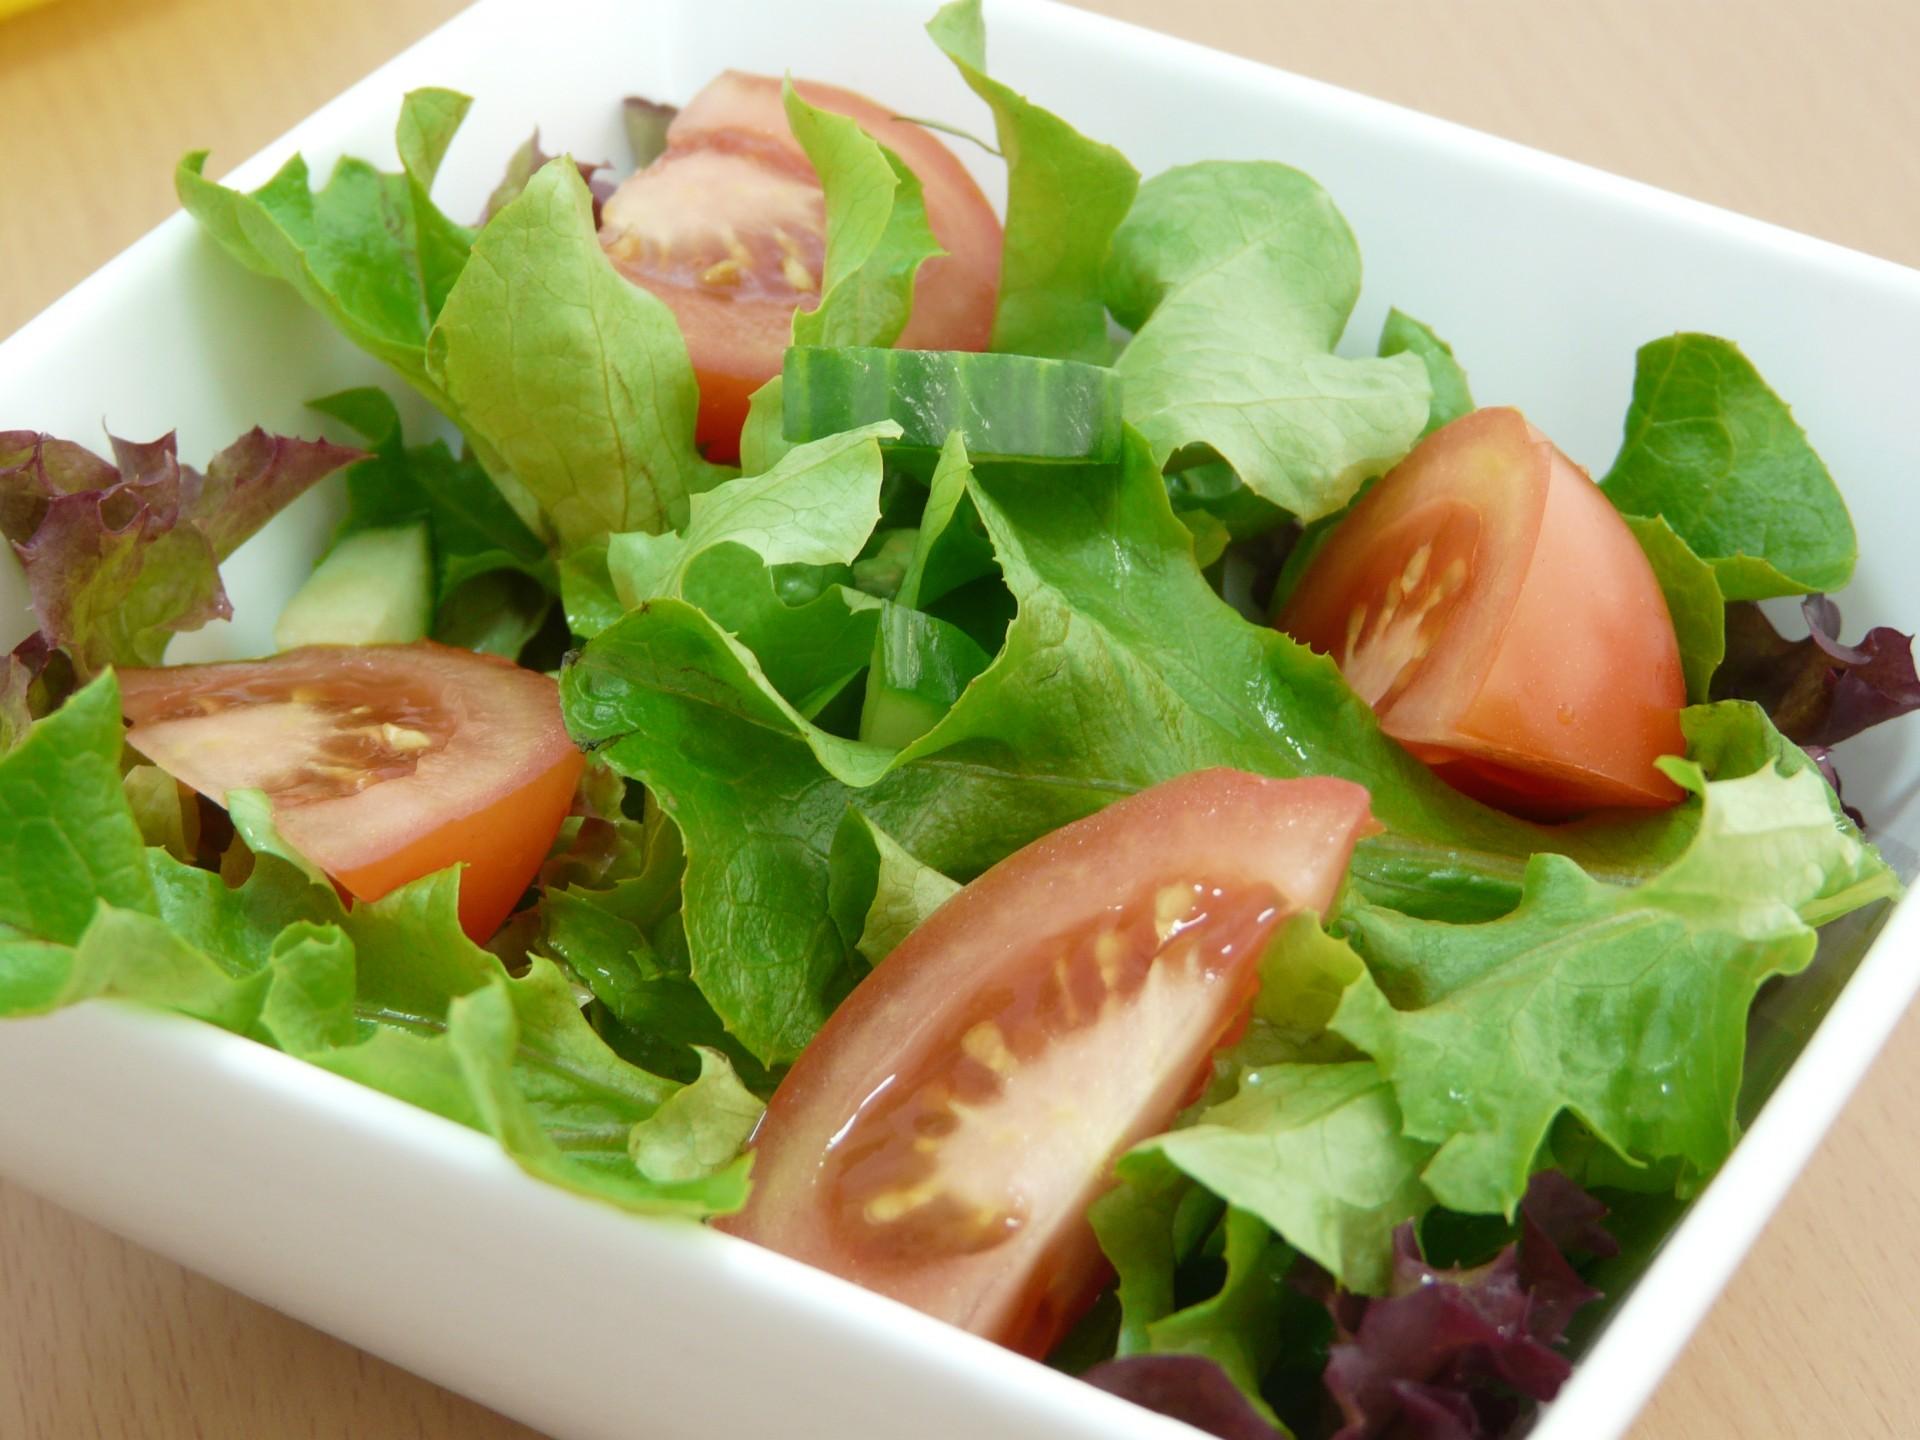 Makaron. Insalata mista. Sałatka. Salat. Trapani. Sycylia. Sicilia. Sizilien.